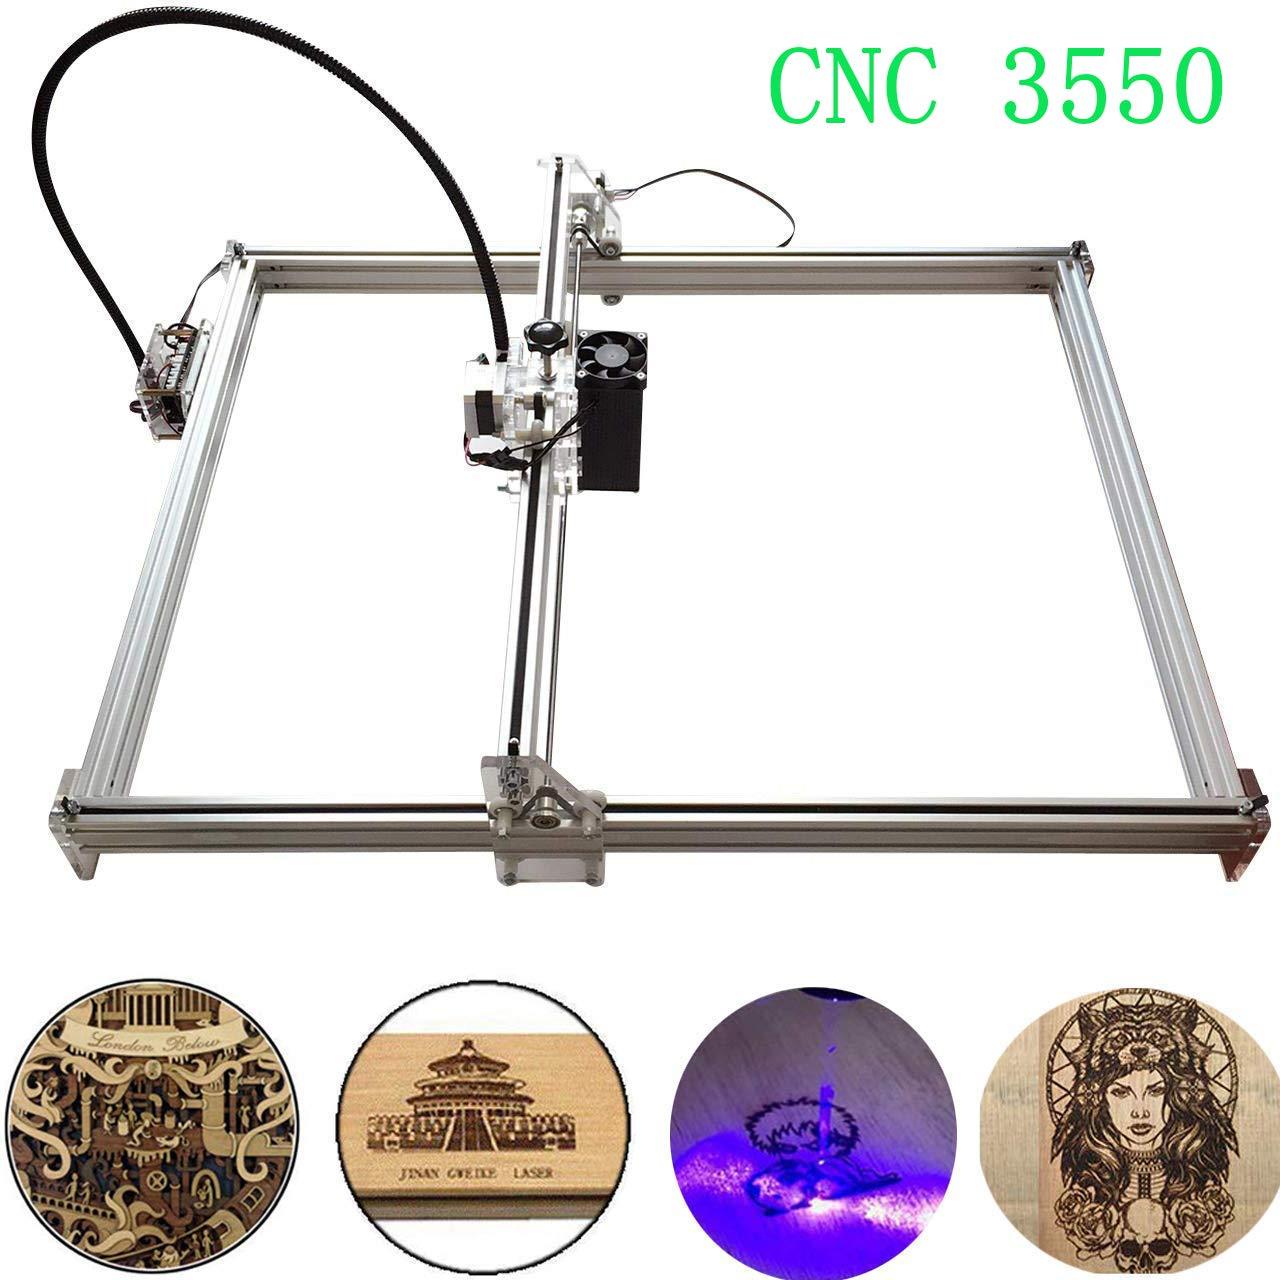 Galleon - 3000mw Carving Machine DIY Kit, 3550 Desktop USB Laser